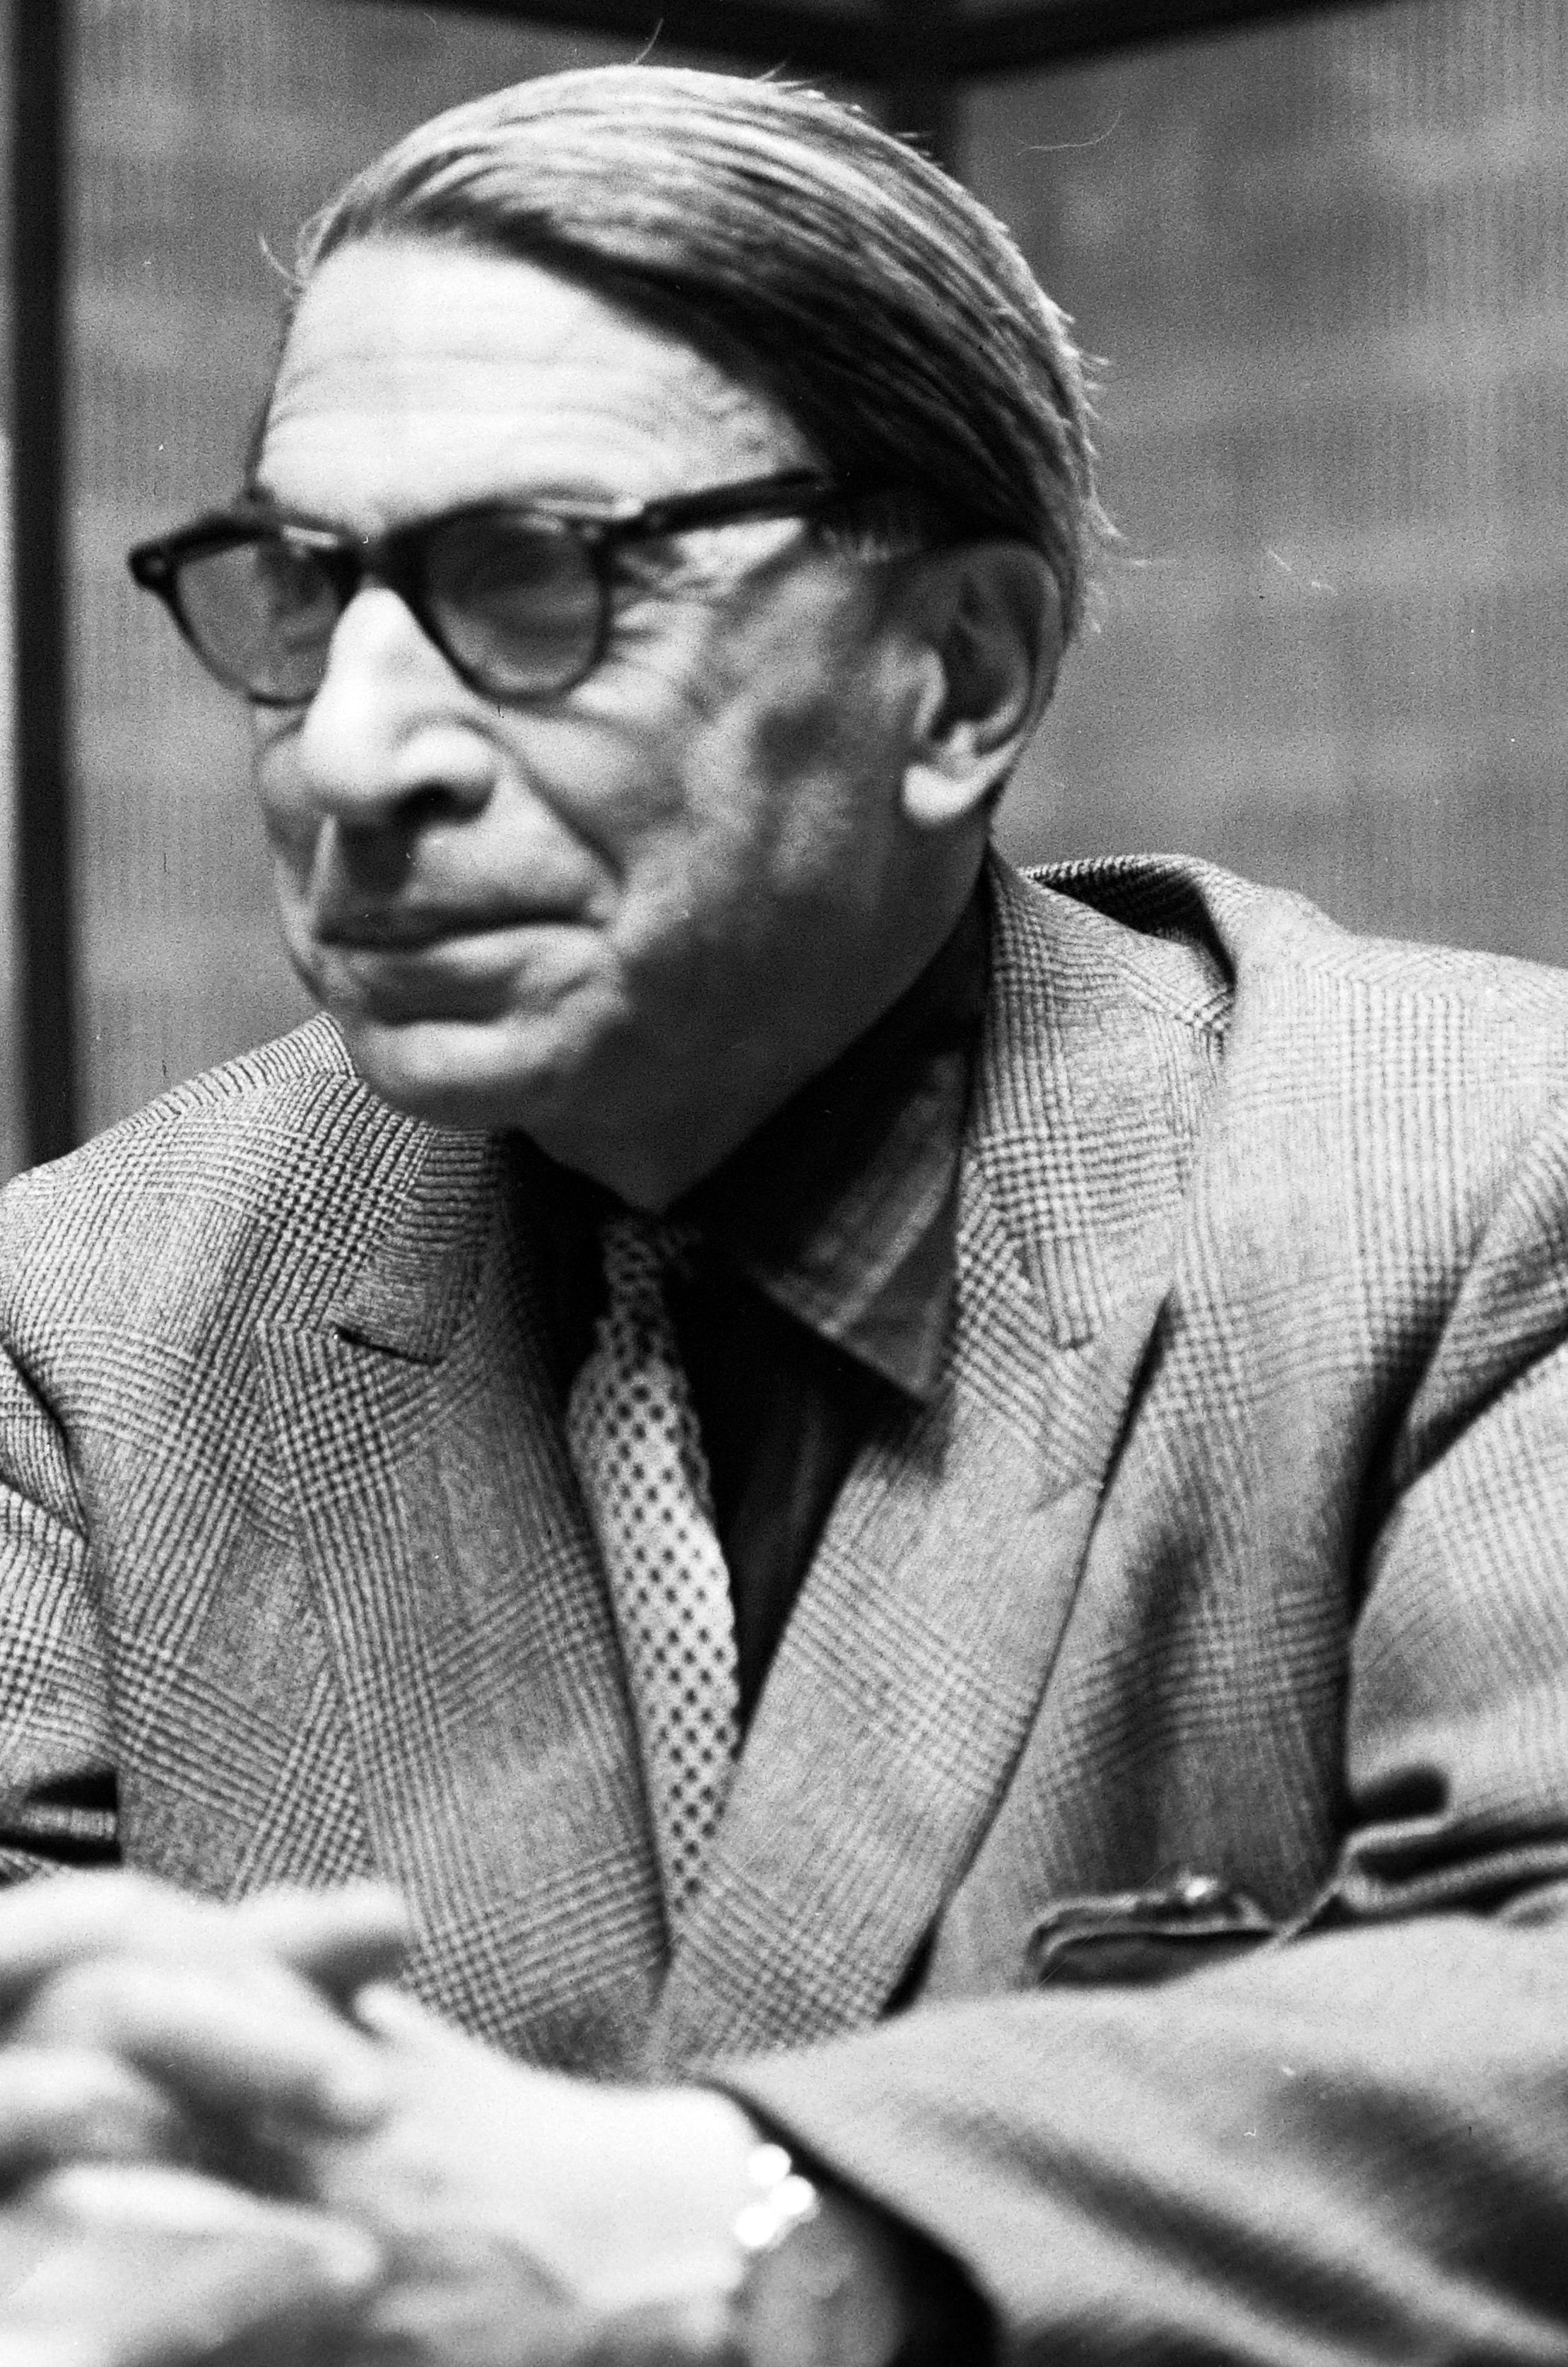 Joseph Kosma